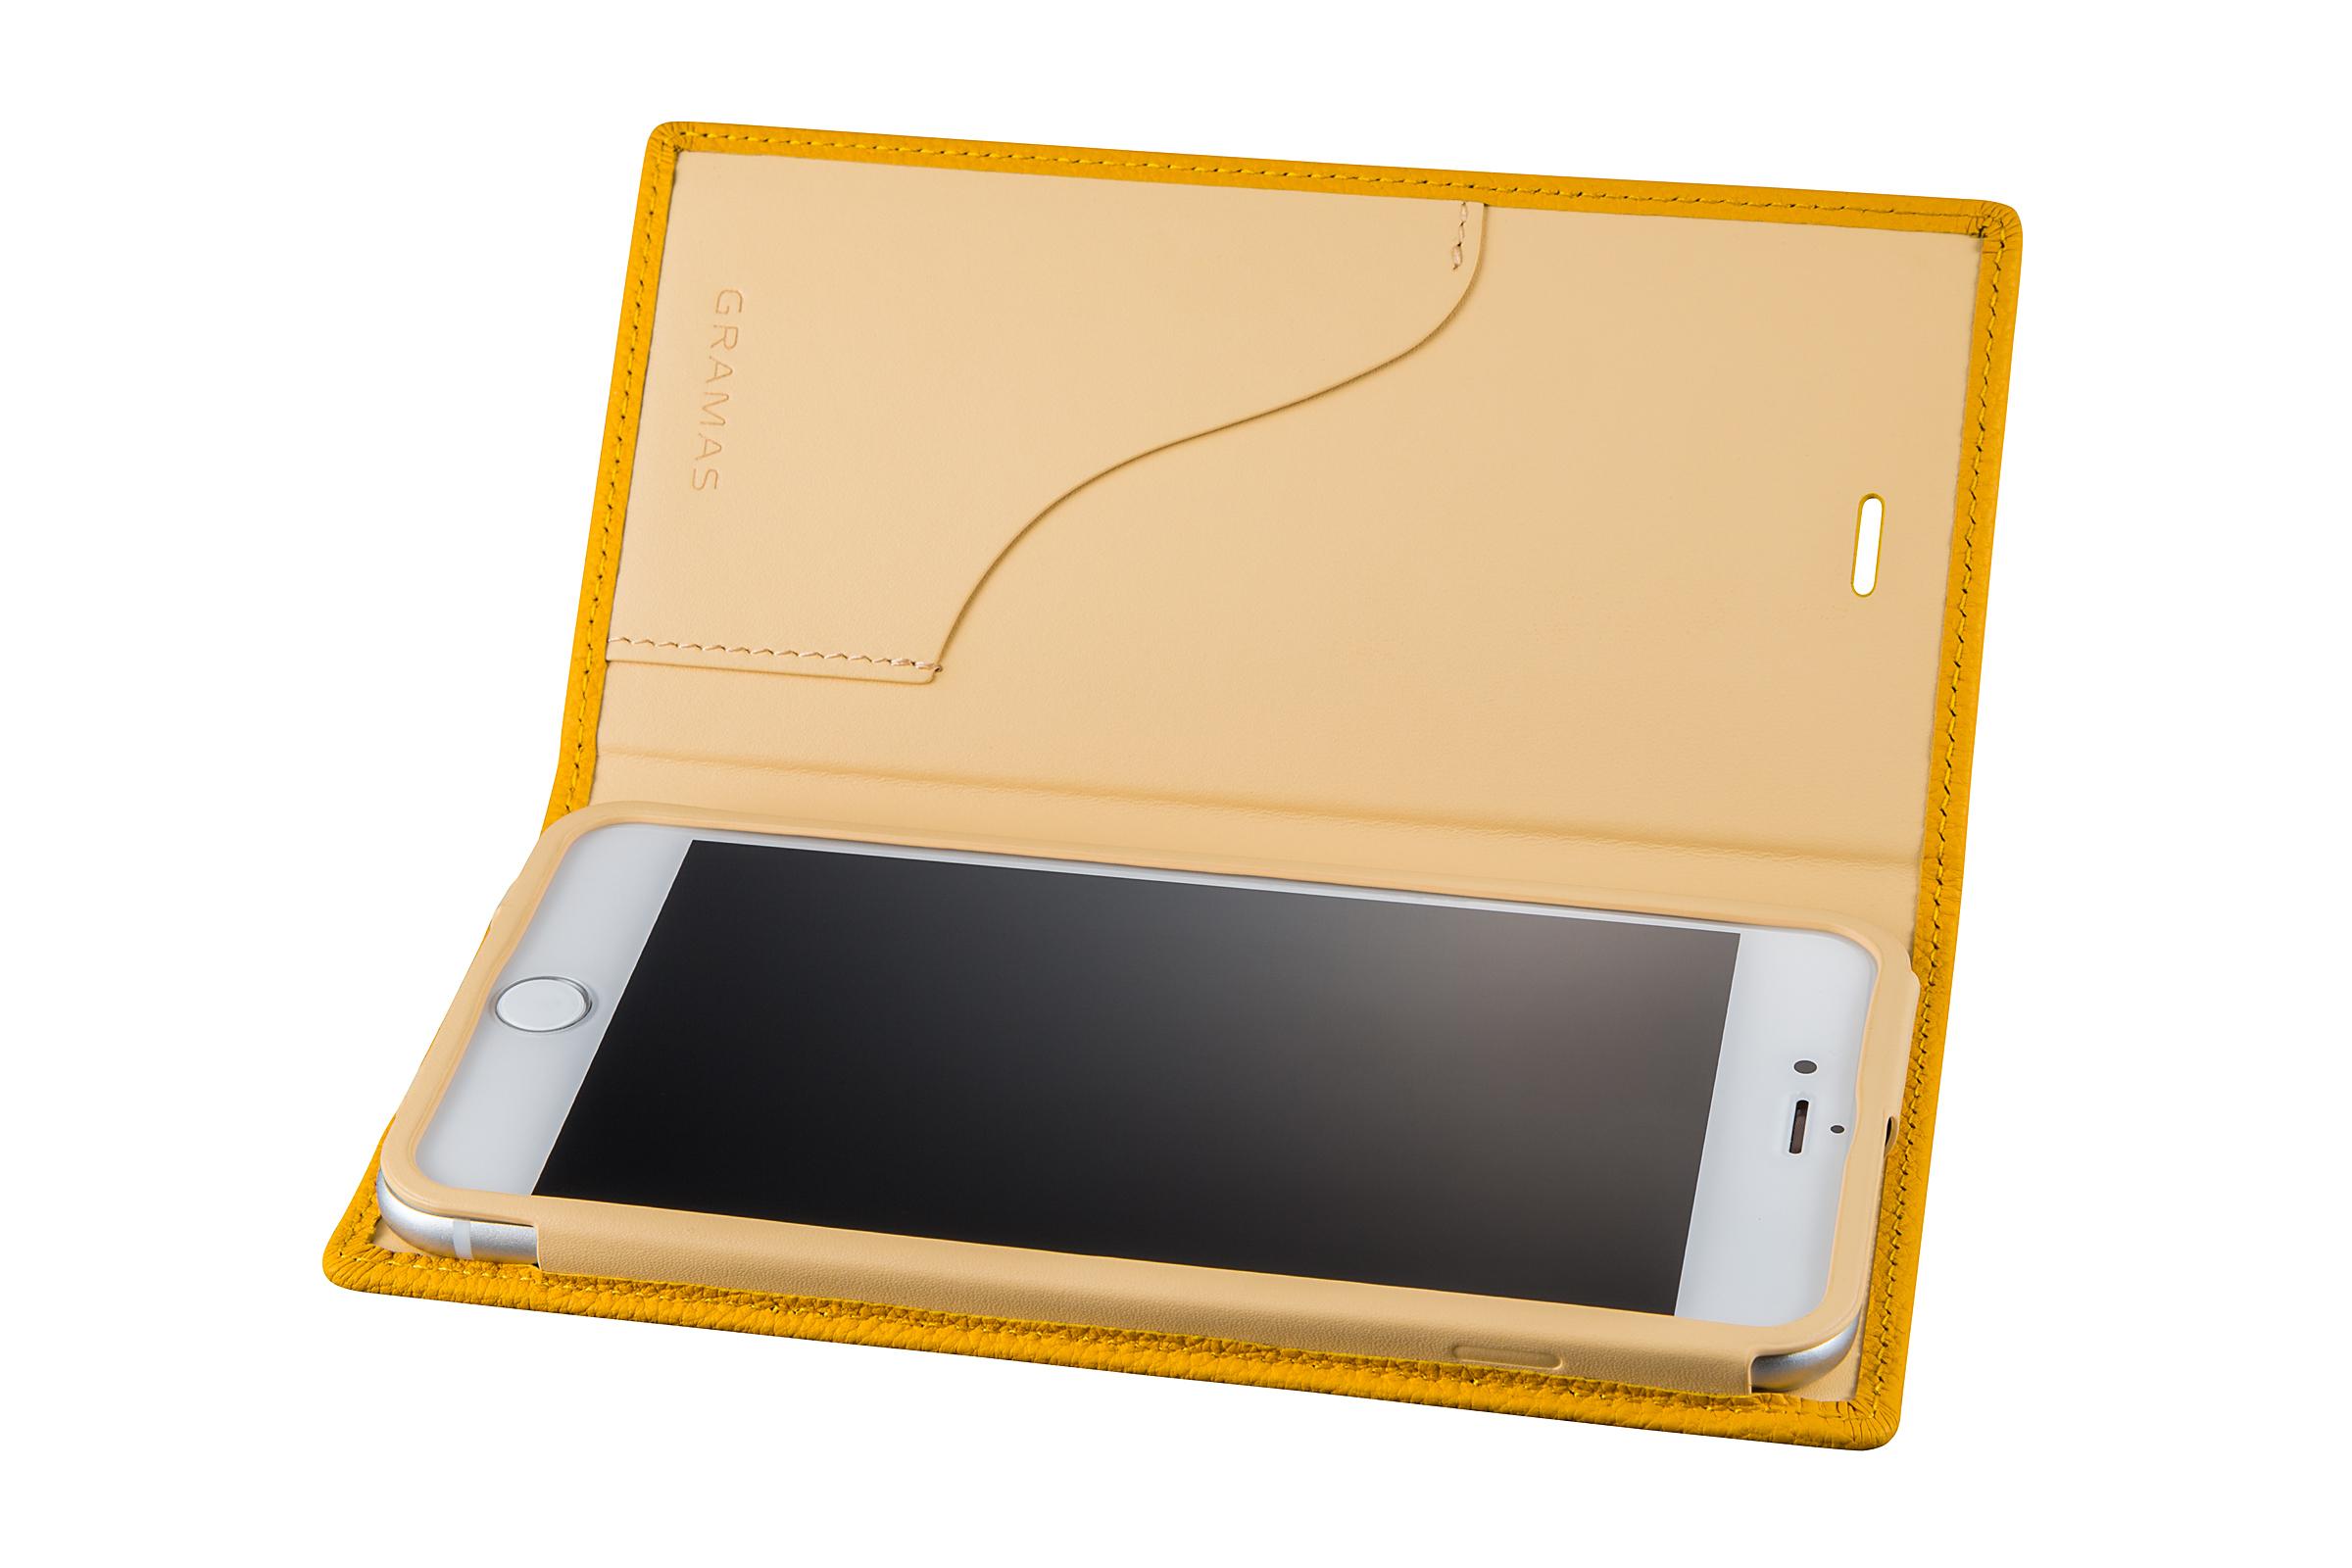 GRAMAS Shrunken-calf Full Leather Case for iPhone 7 Plus(Yellow) シュランケンカーフ 手帳型フルレザーケース - 画像3